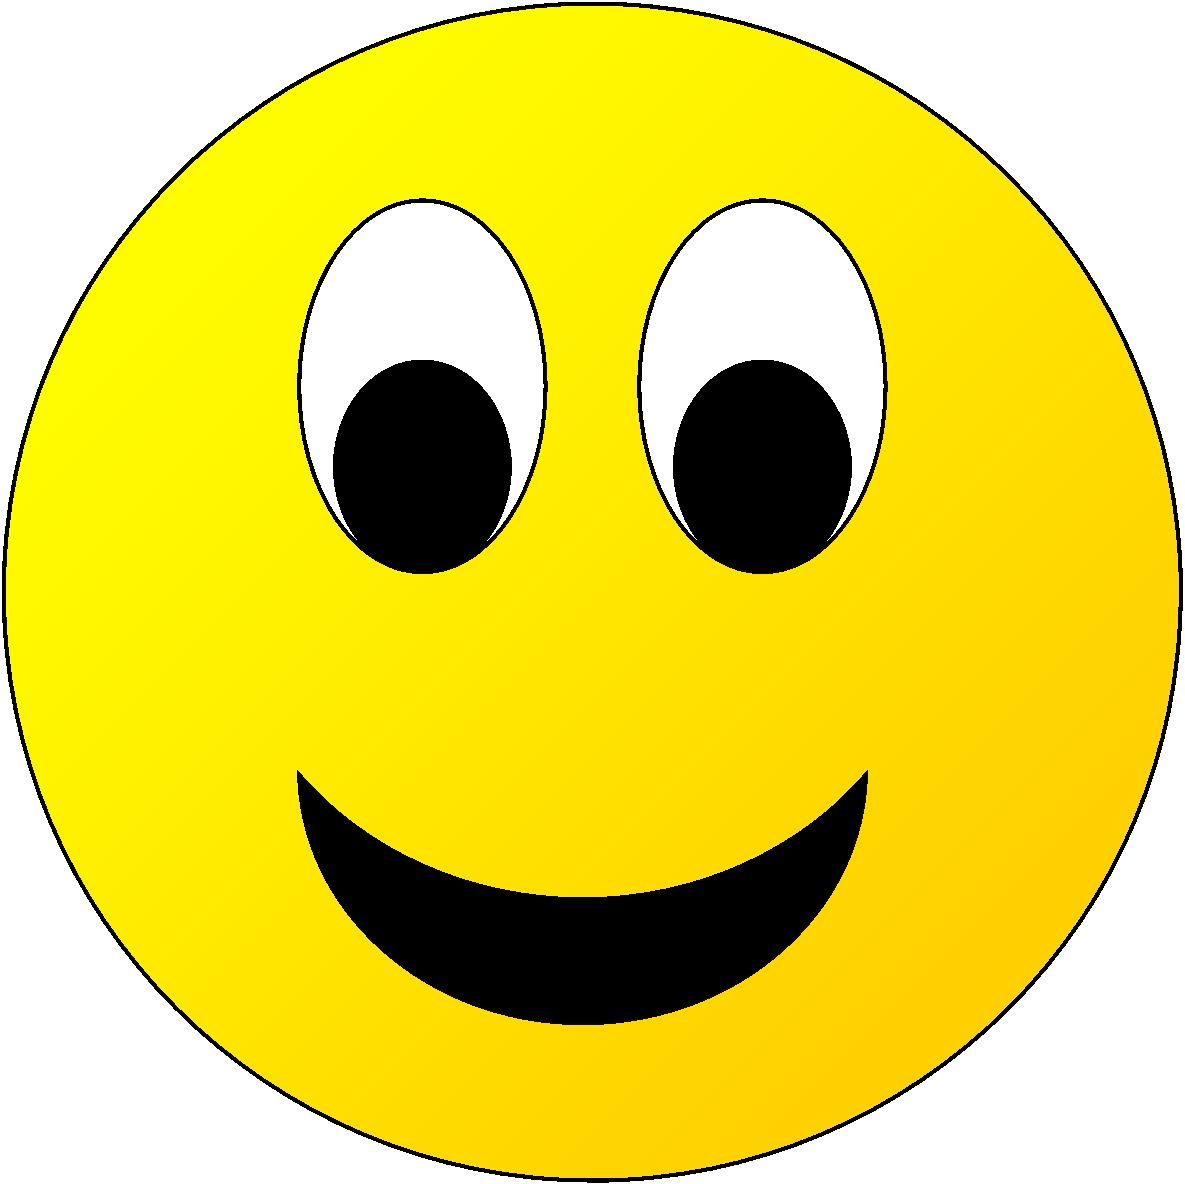 Smiley clipart symbol. Happy face star panda